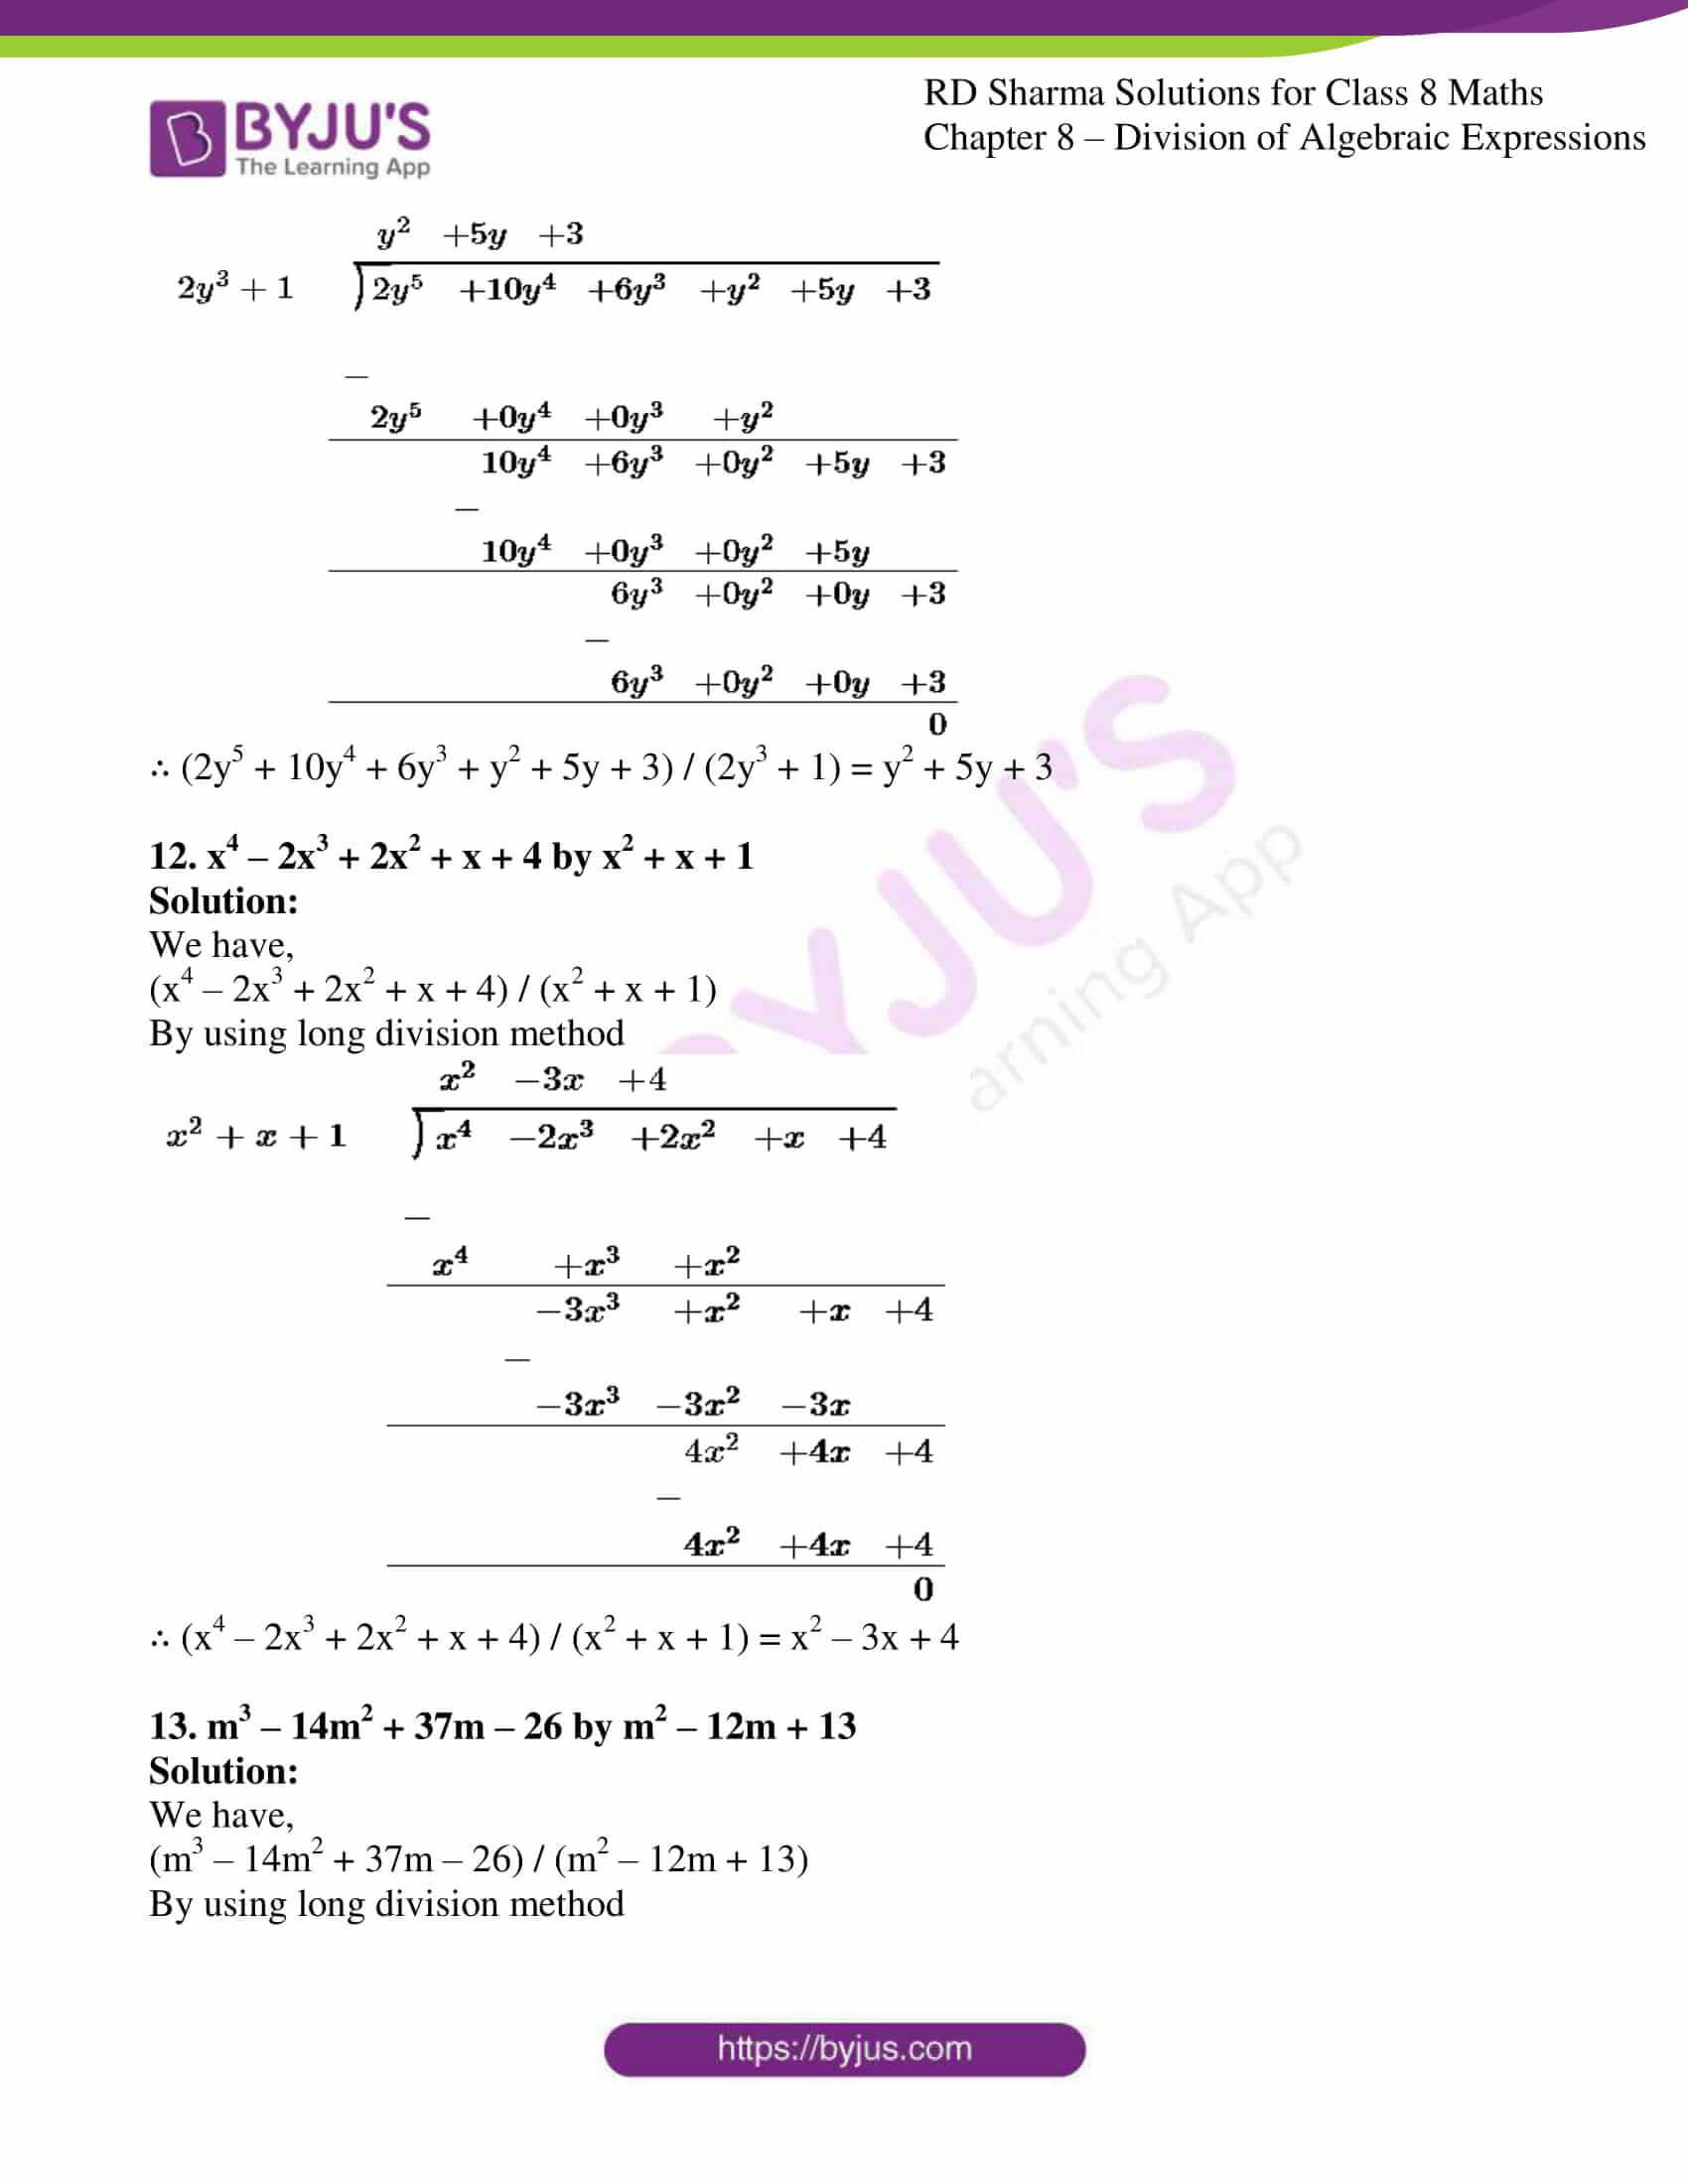 rd sharma class 8 maths chapter 8 exercise 4 05